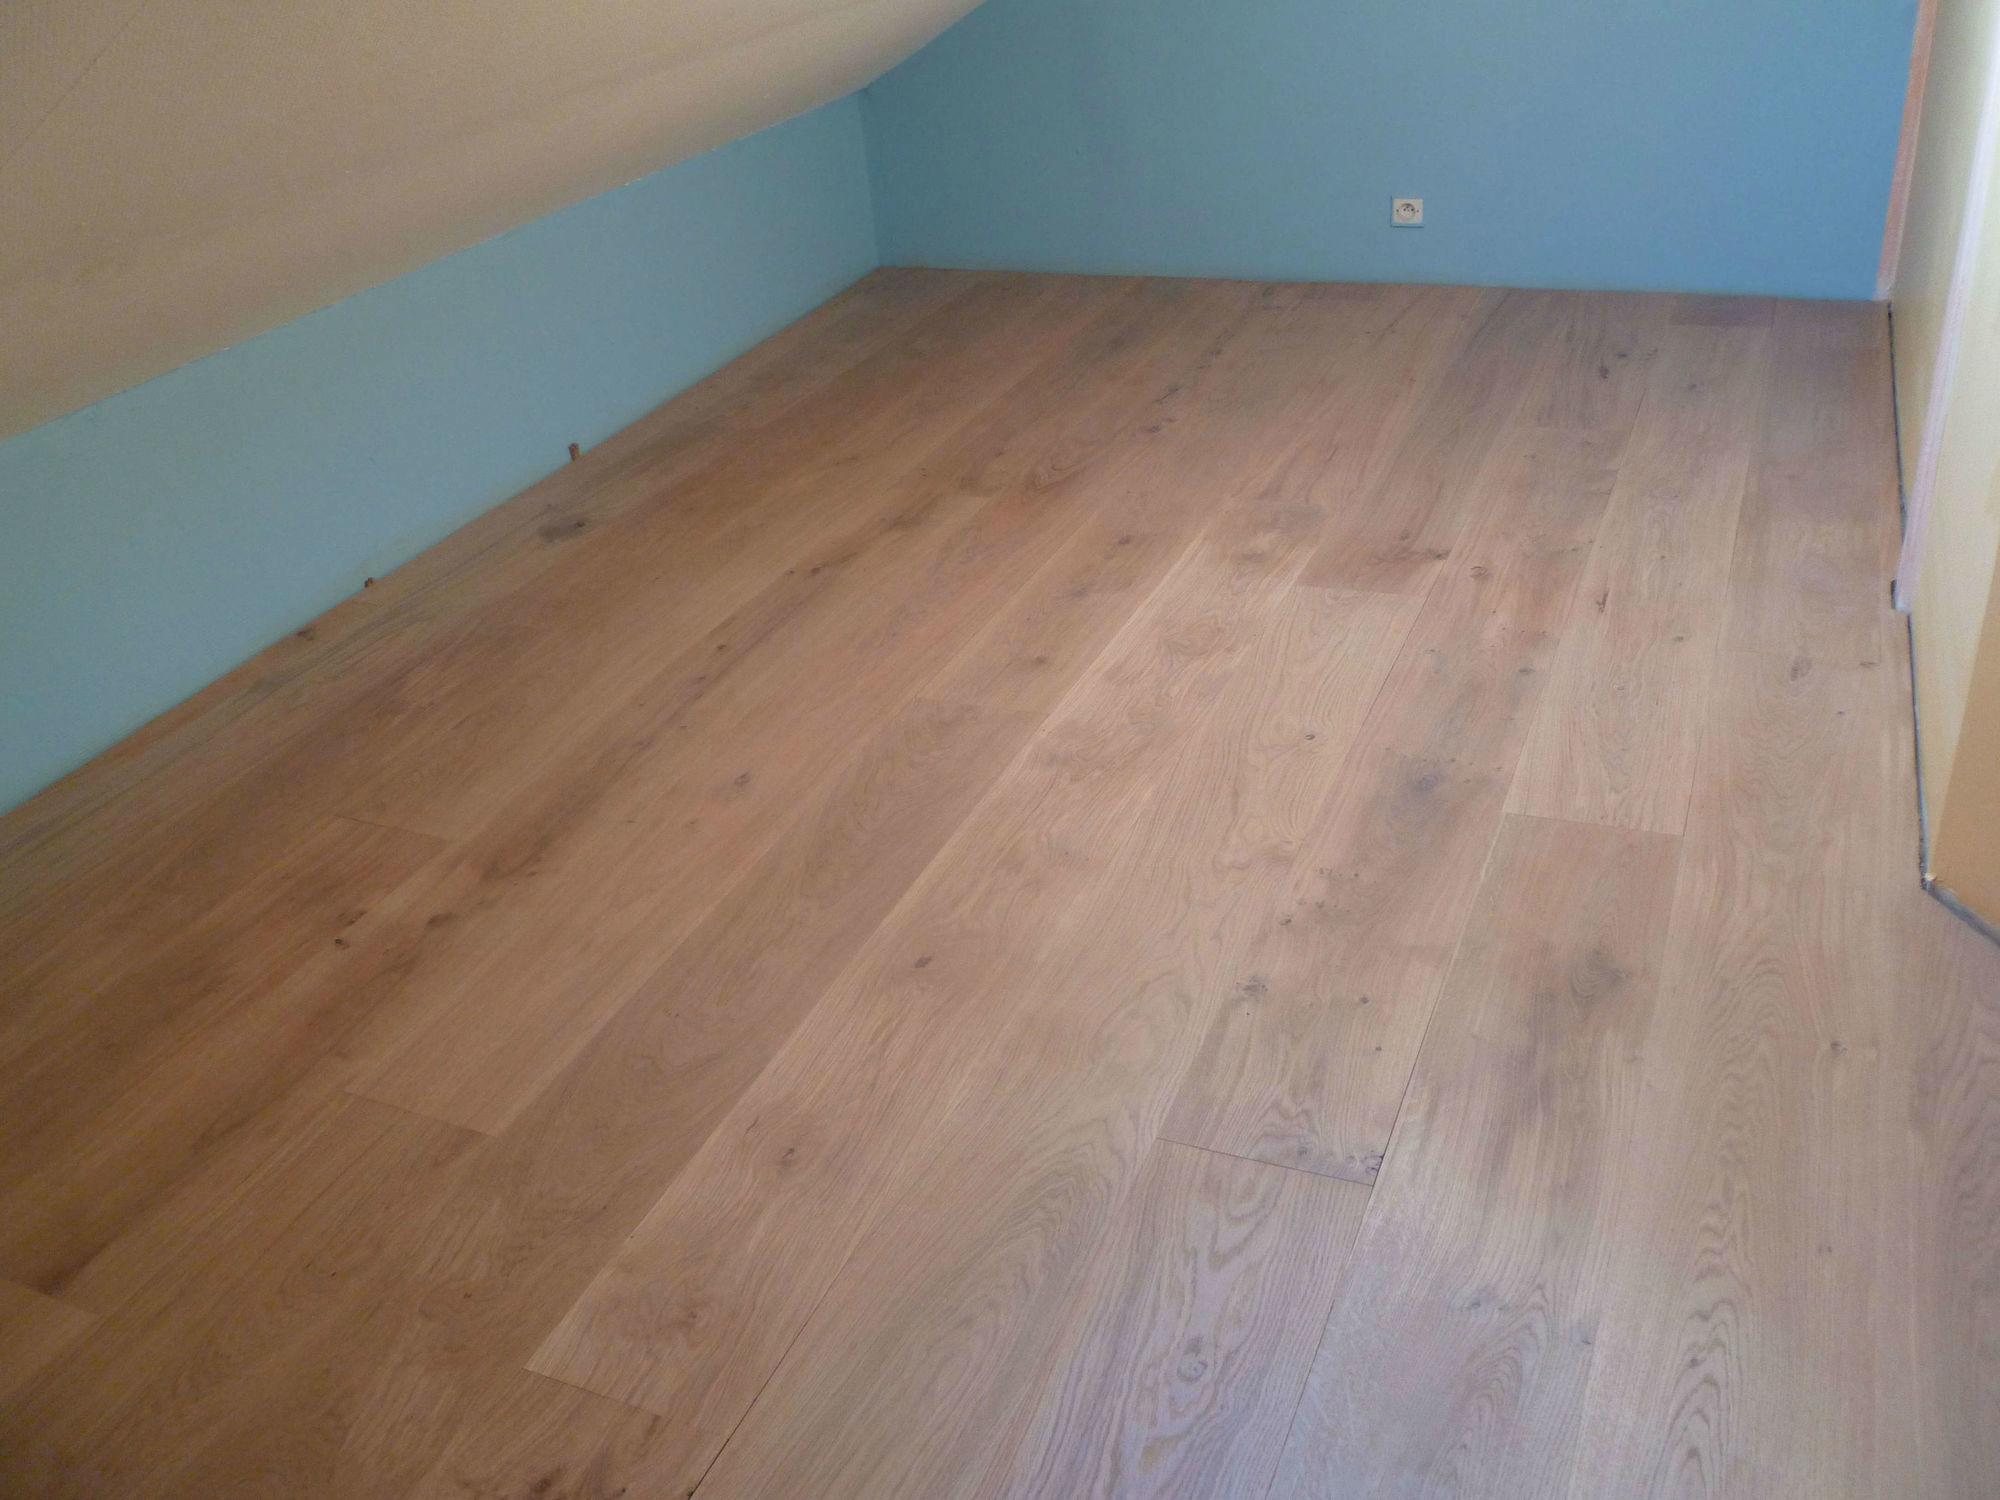 chanfrein parquet cool plancher chene blanchi avec parquet chene massif blanchi latest cliquez. Black Bedroom Furniture Sets. Home Design Ideas